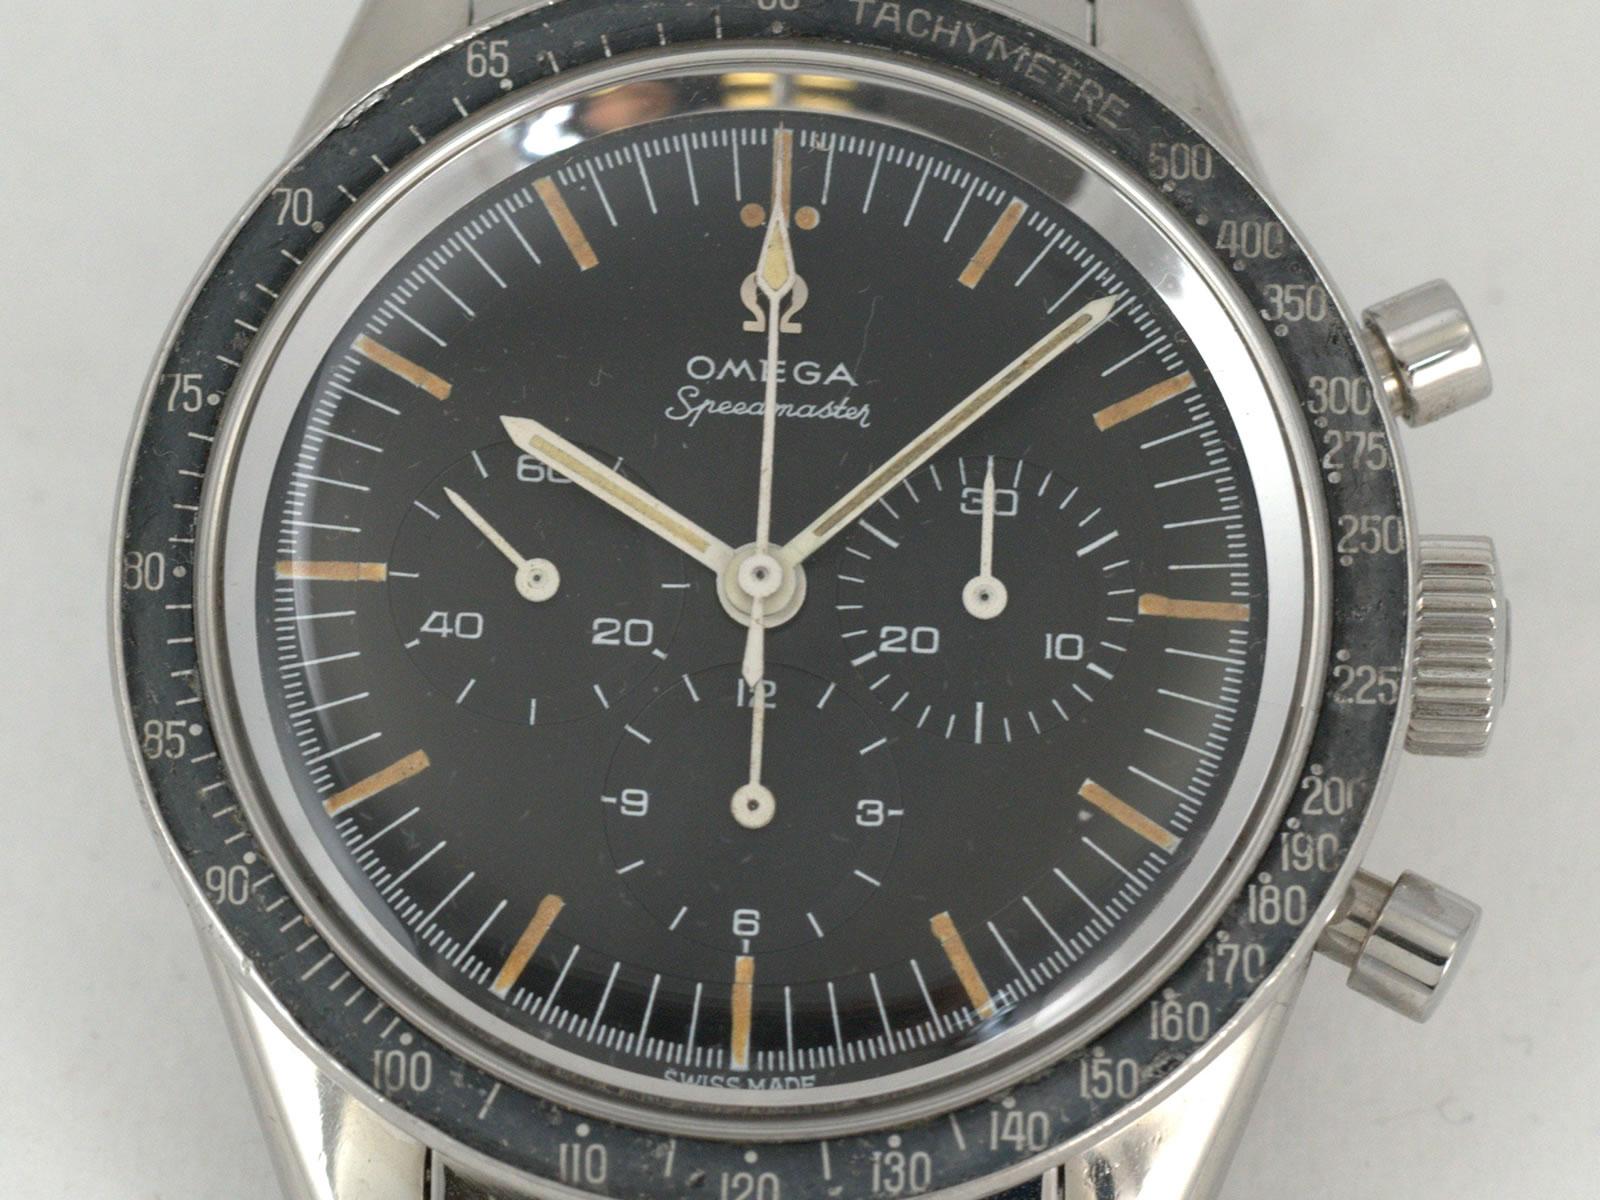 omega-speedmaster-105-002-.jpg